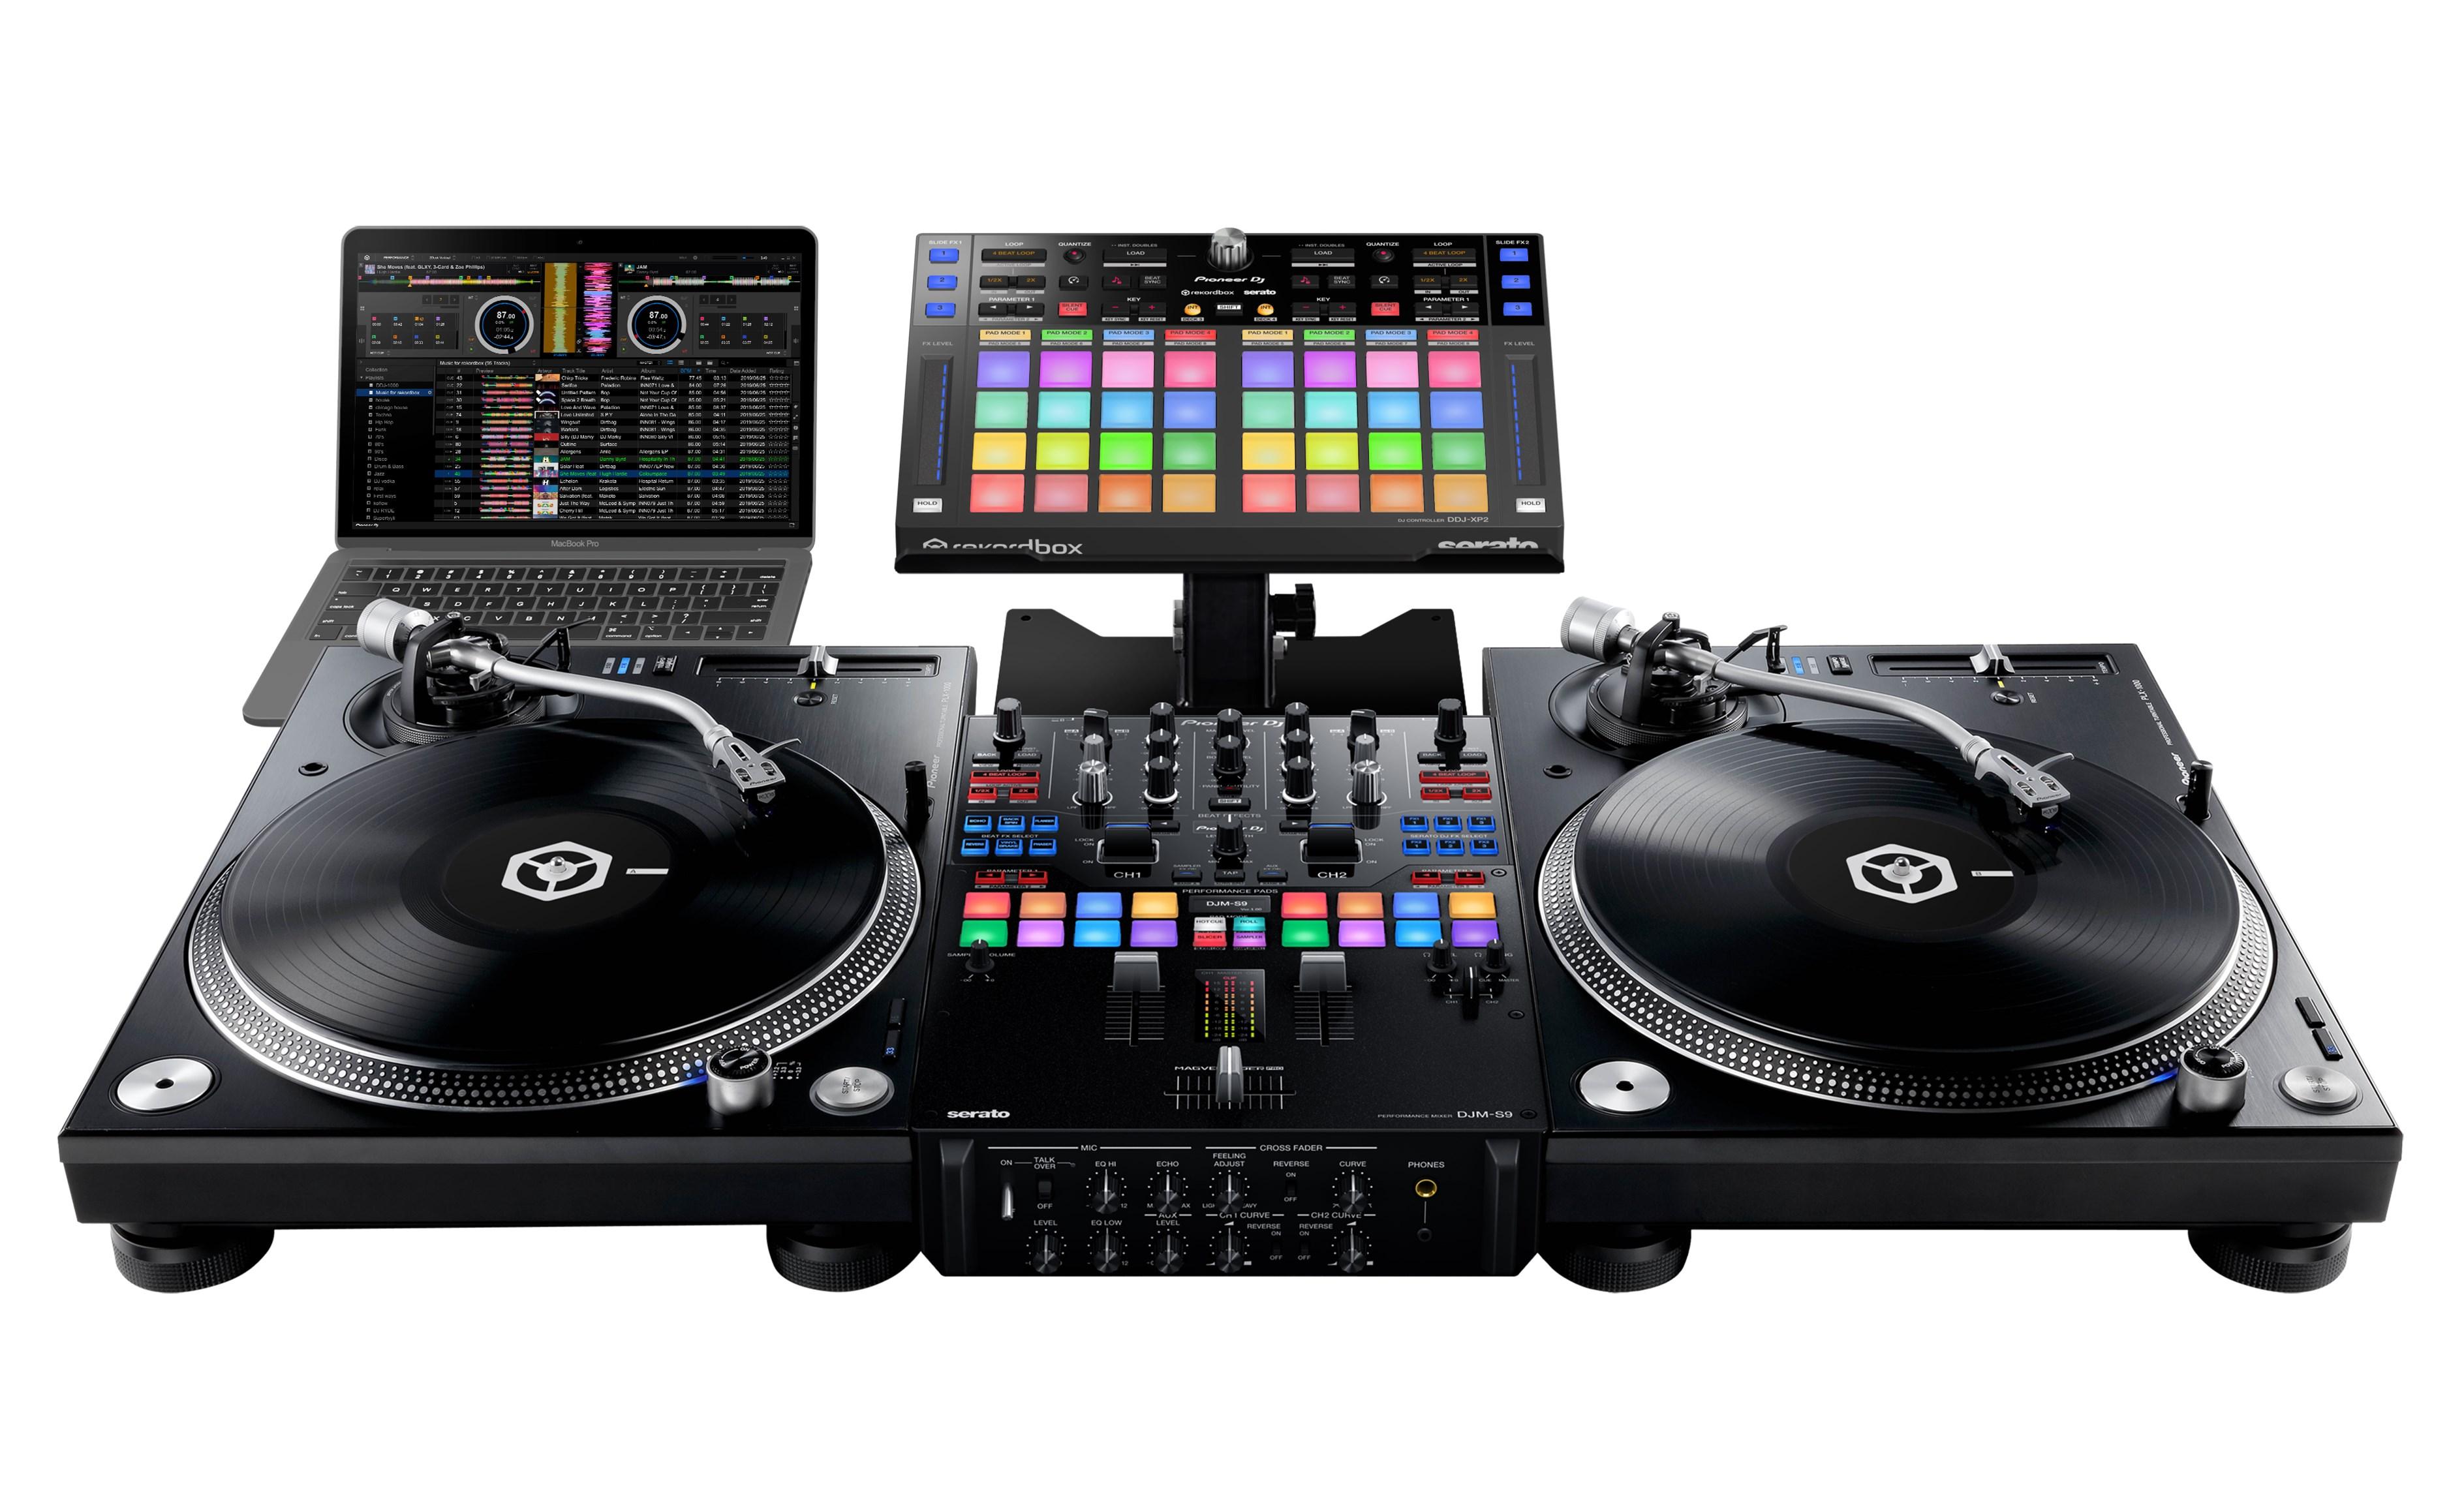 rekordbox dj - Sequencer - YouTube